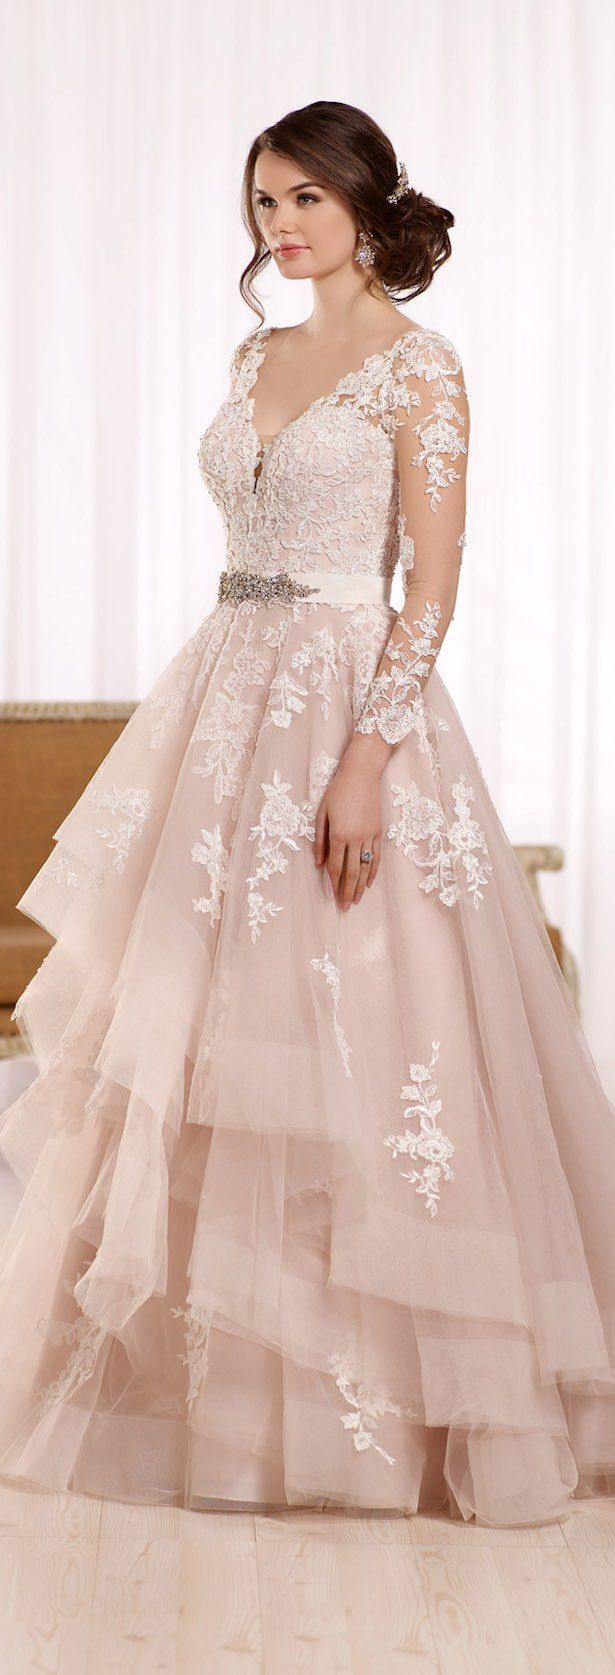 Essense of Australia Fall 2016 | Wedding | Pinterest | Vestidos de ...